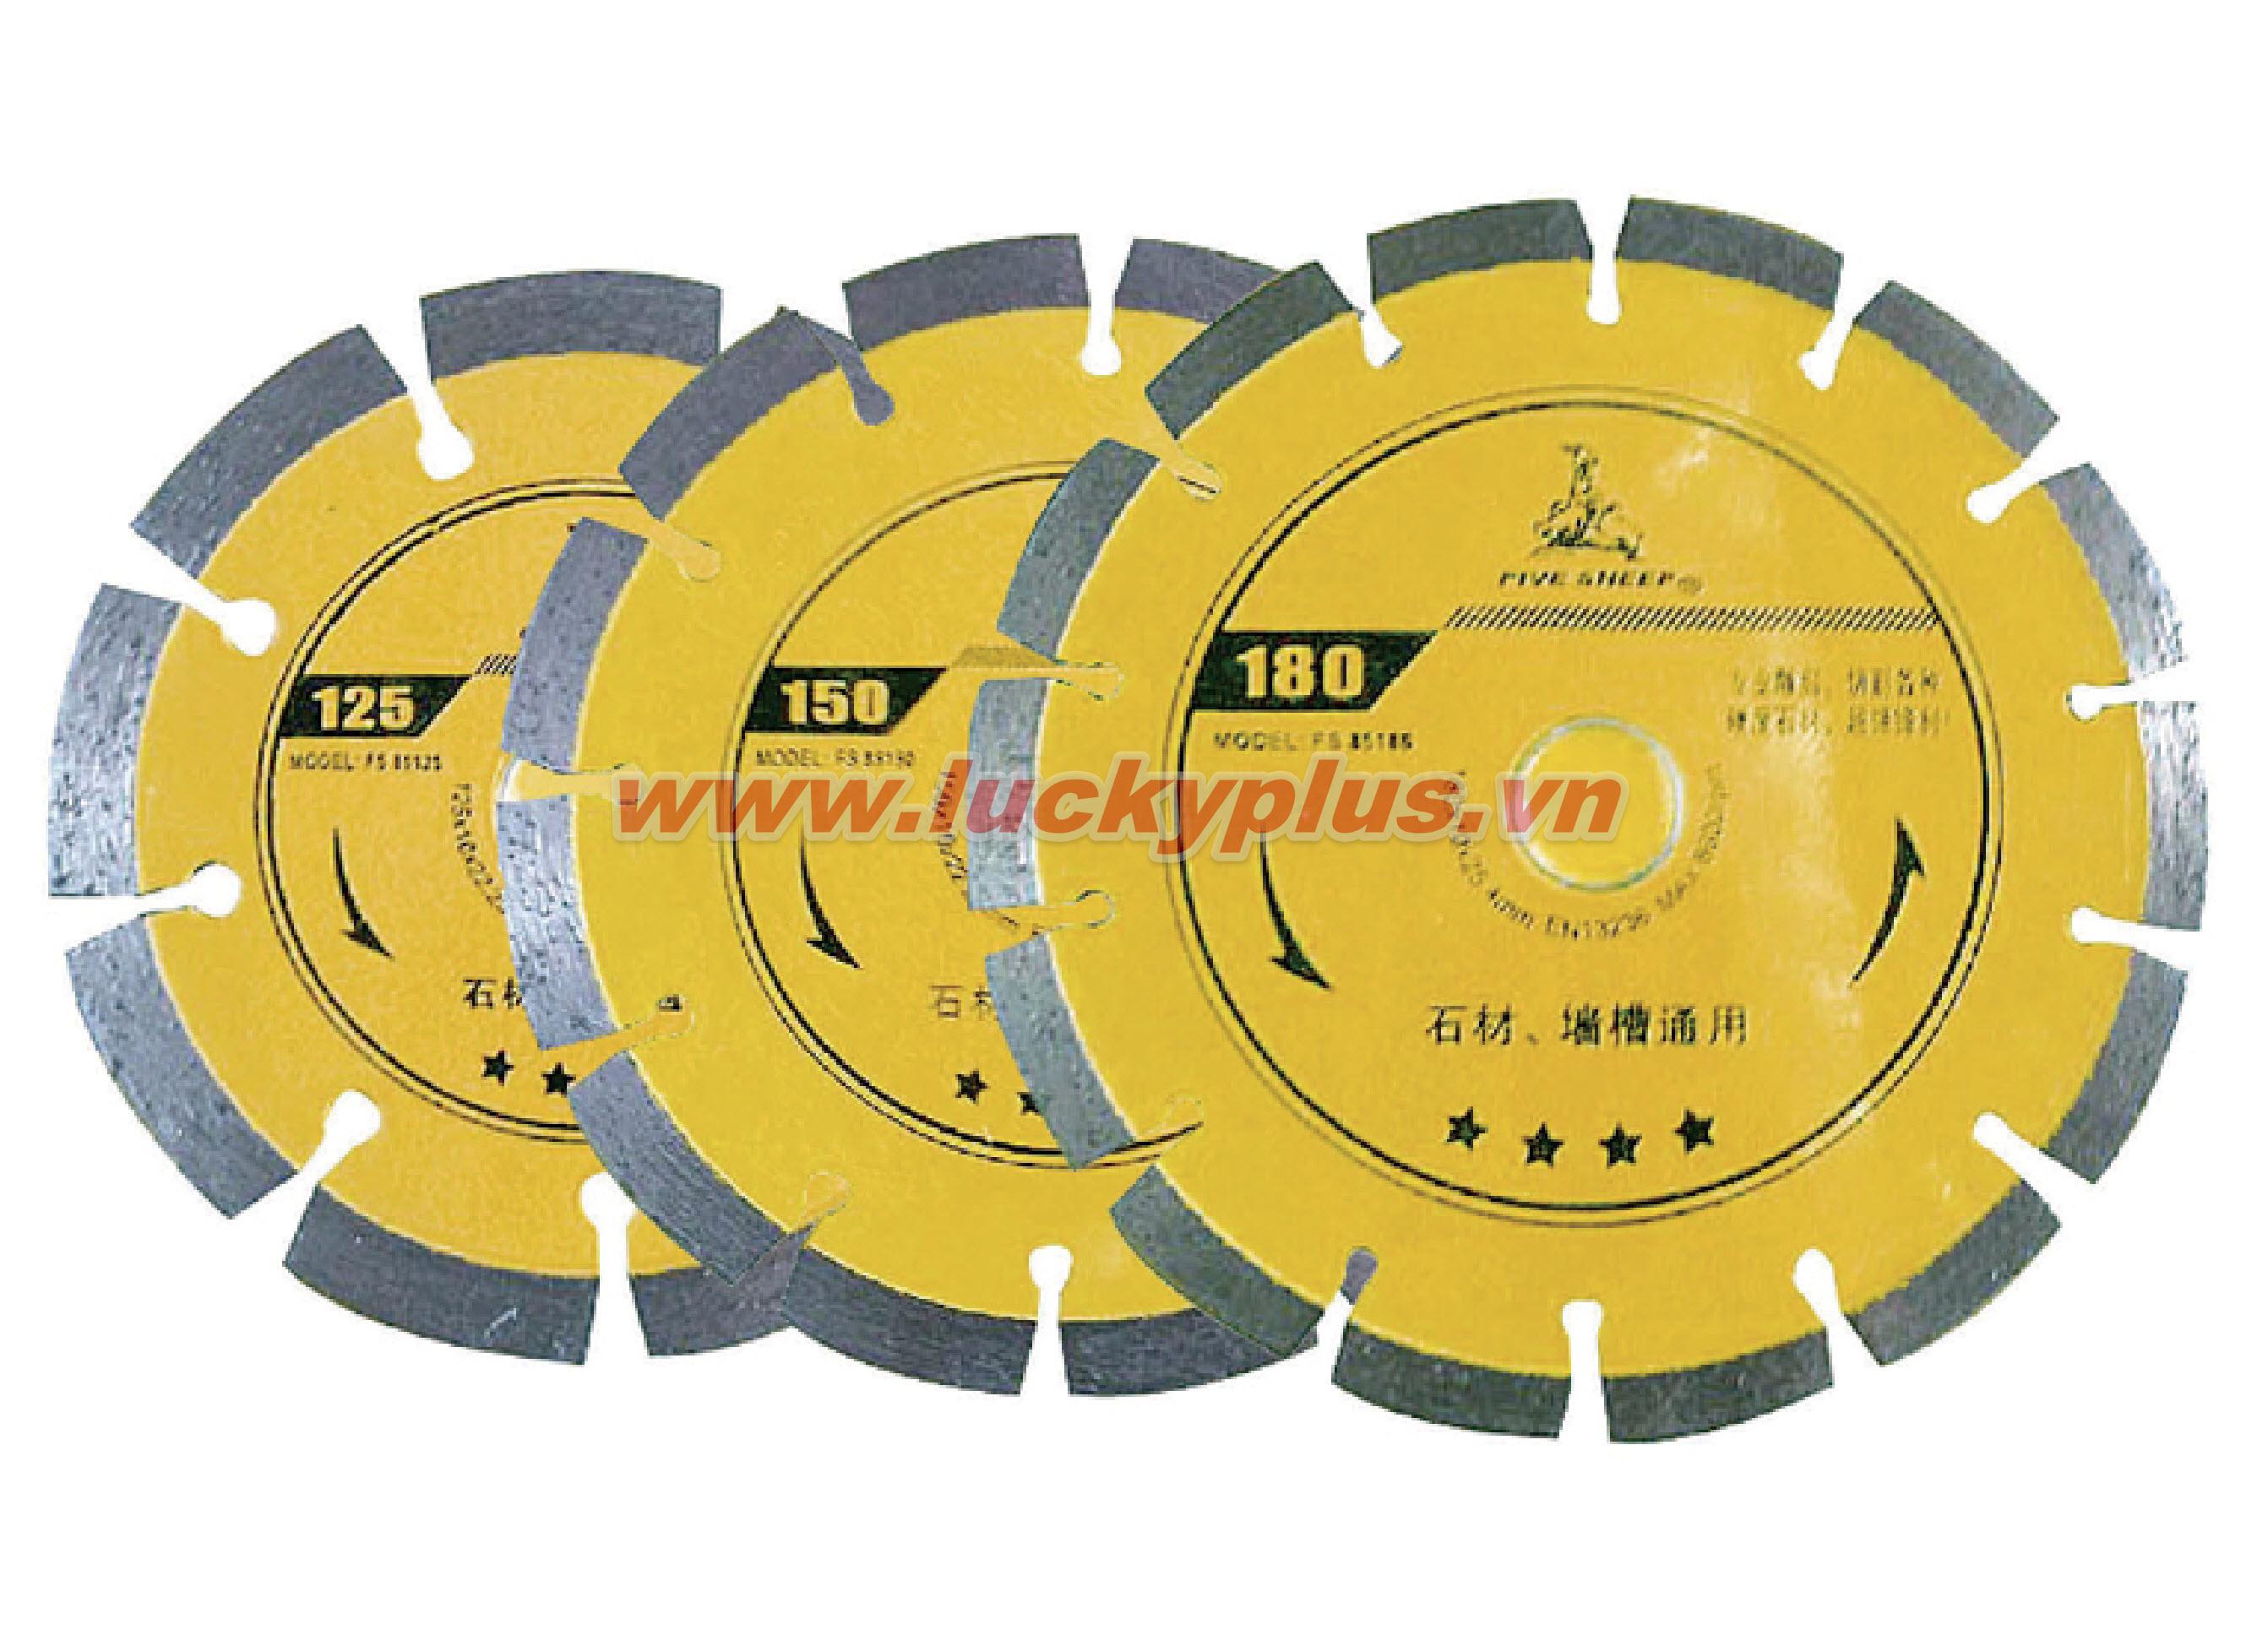 Đá cắt  FiveSheep FS-85125 125mm, FS-85150 150mm, FS-85180 180mm